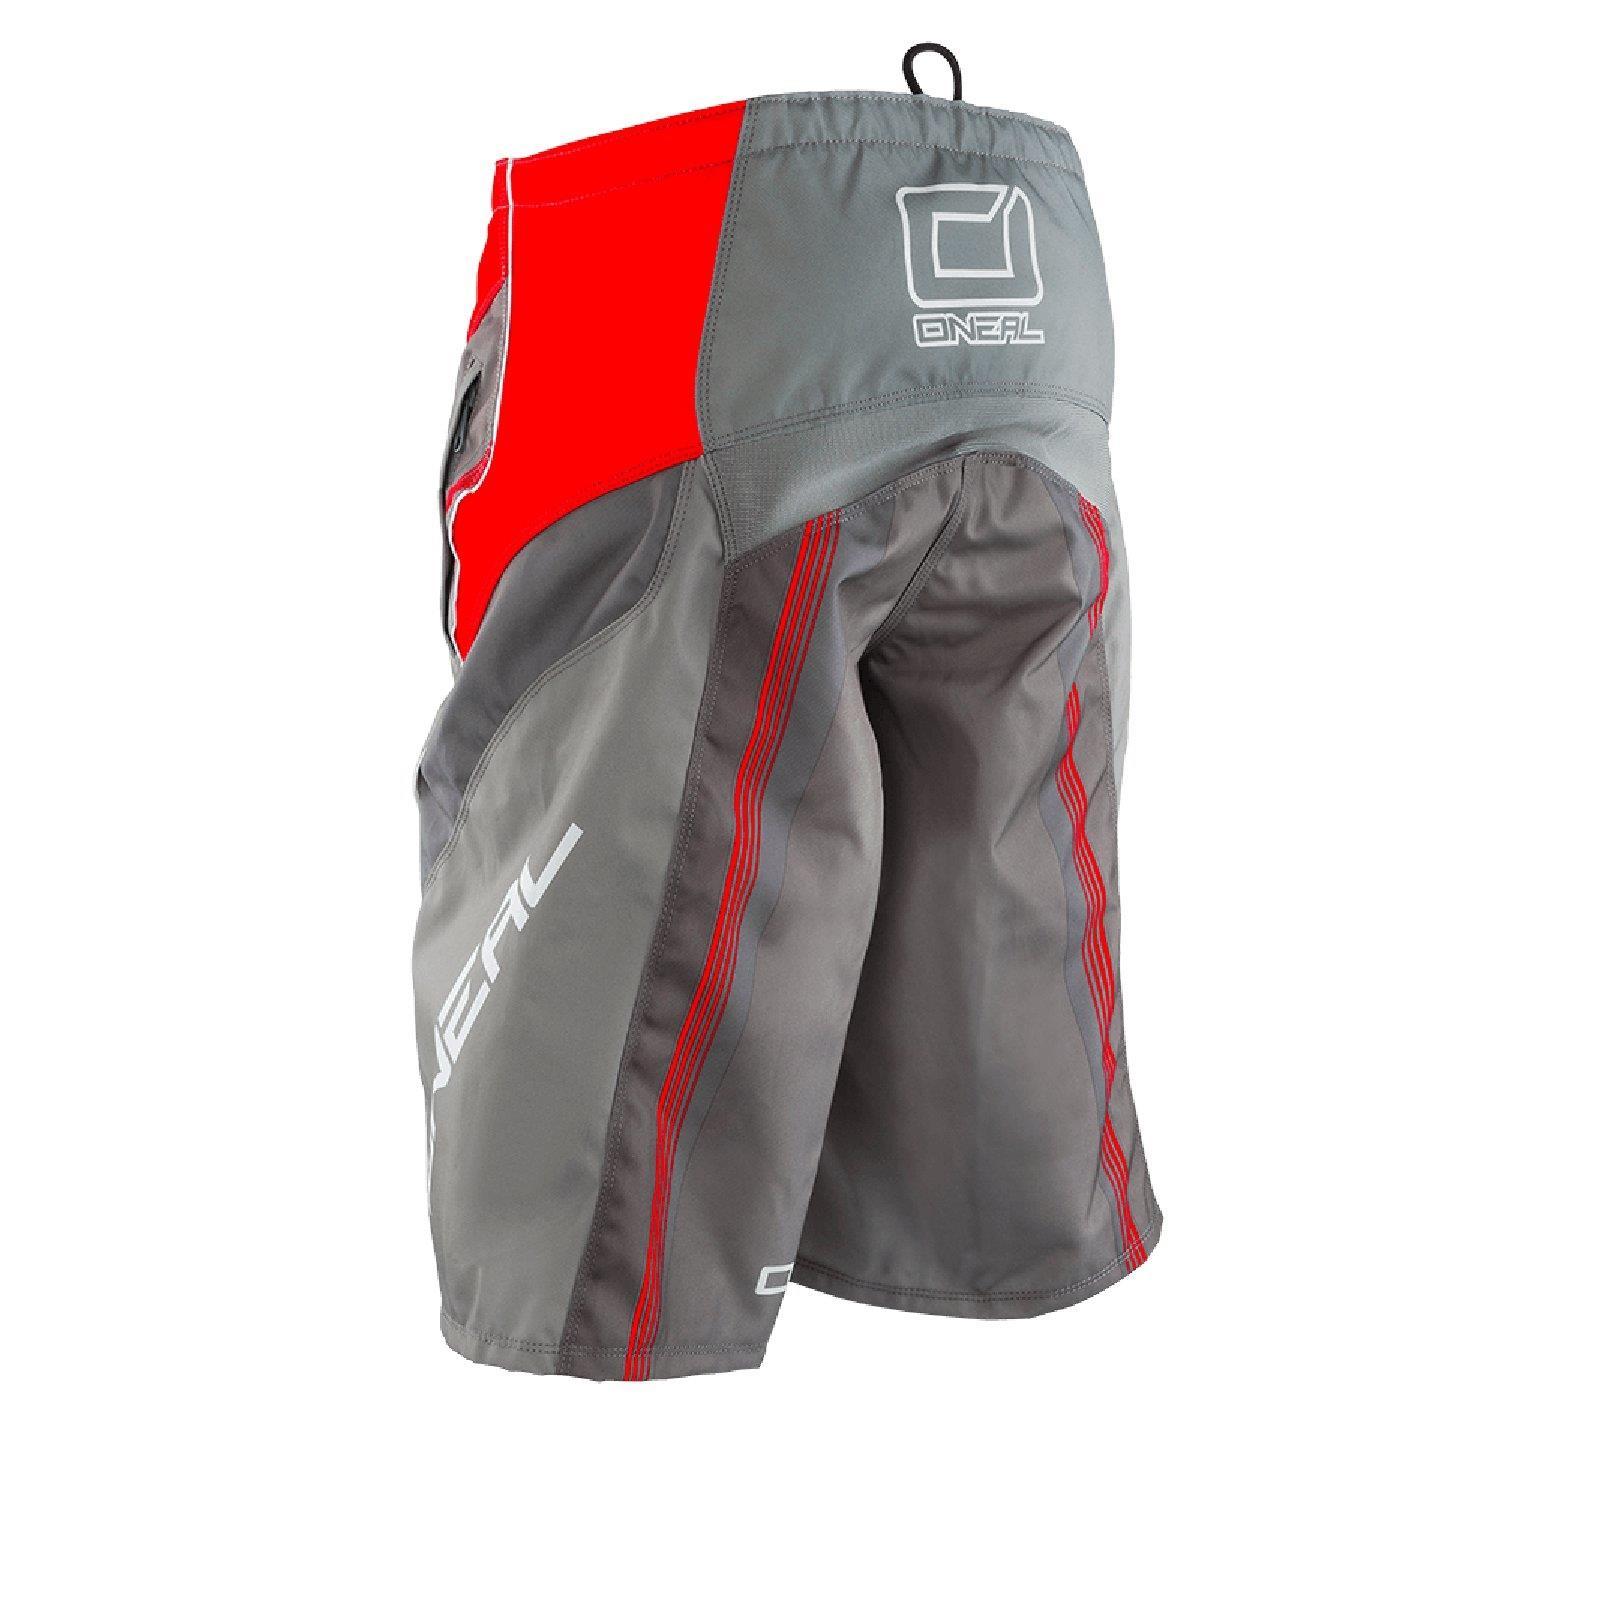 ONeal-pantalones-de-Jersey-de-los-ninos-de-pantalones-cortos-ninos-MX-bicicleta-DH-montana-bicicleta miniatura 44